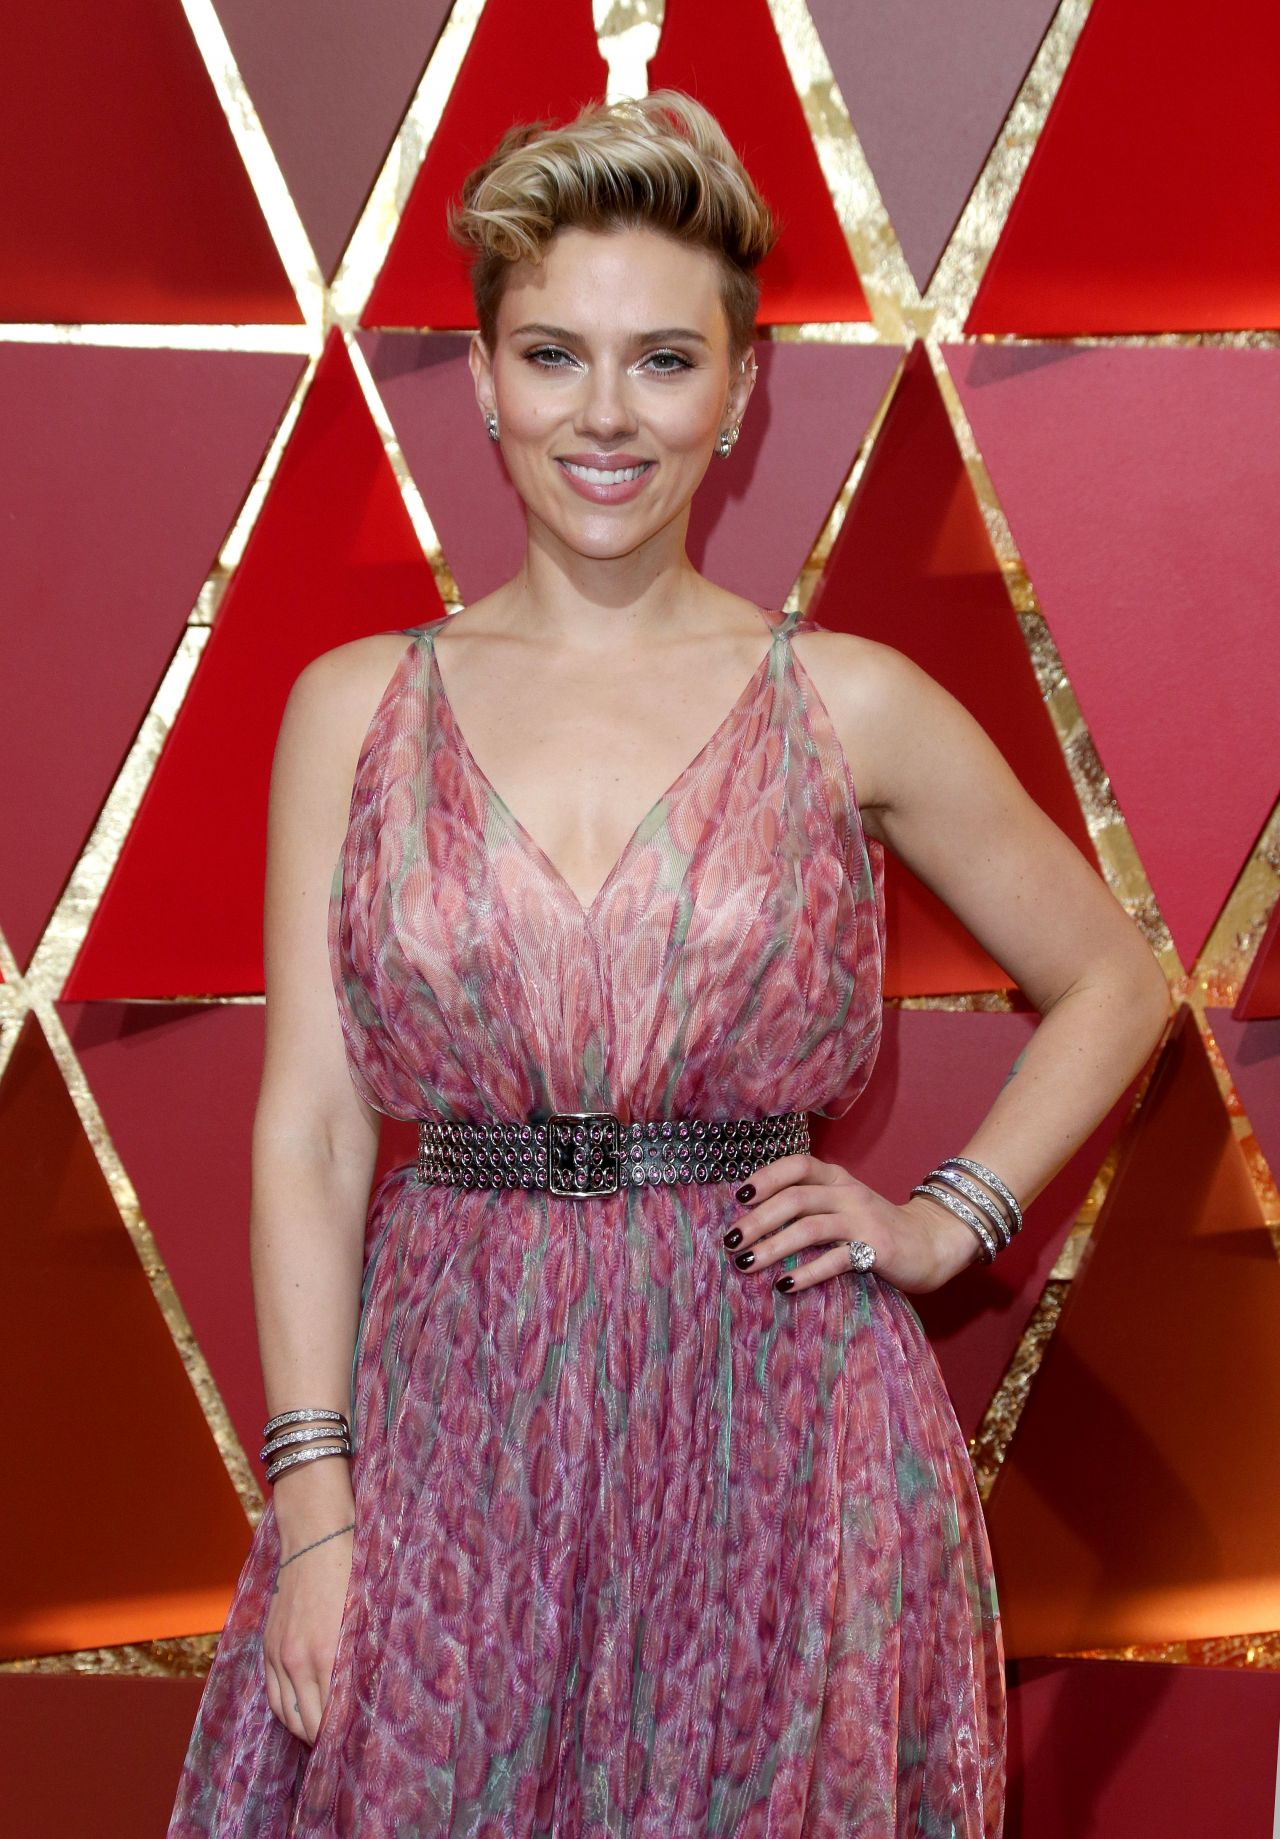 Scarlett Johansson Oscars 2017 Red Carpet In Hollywood